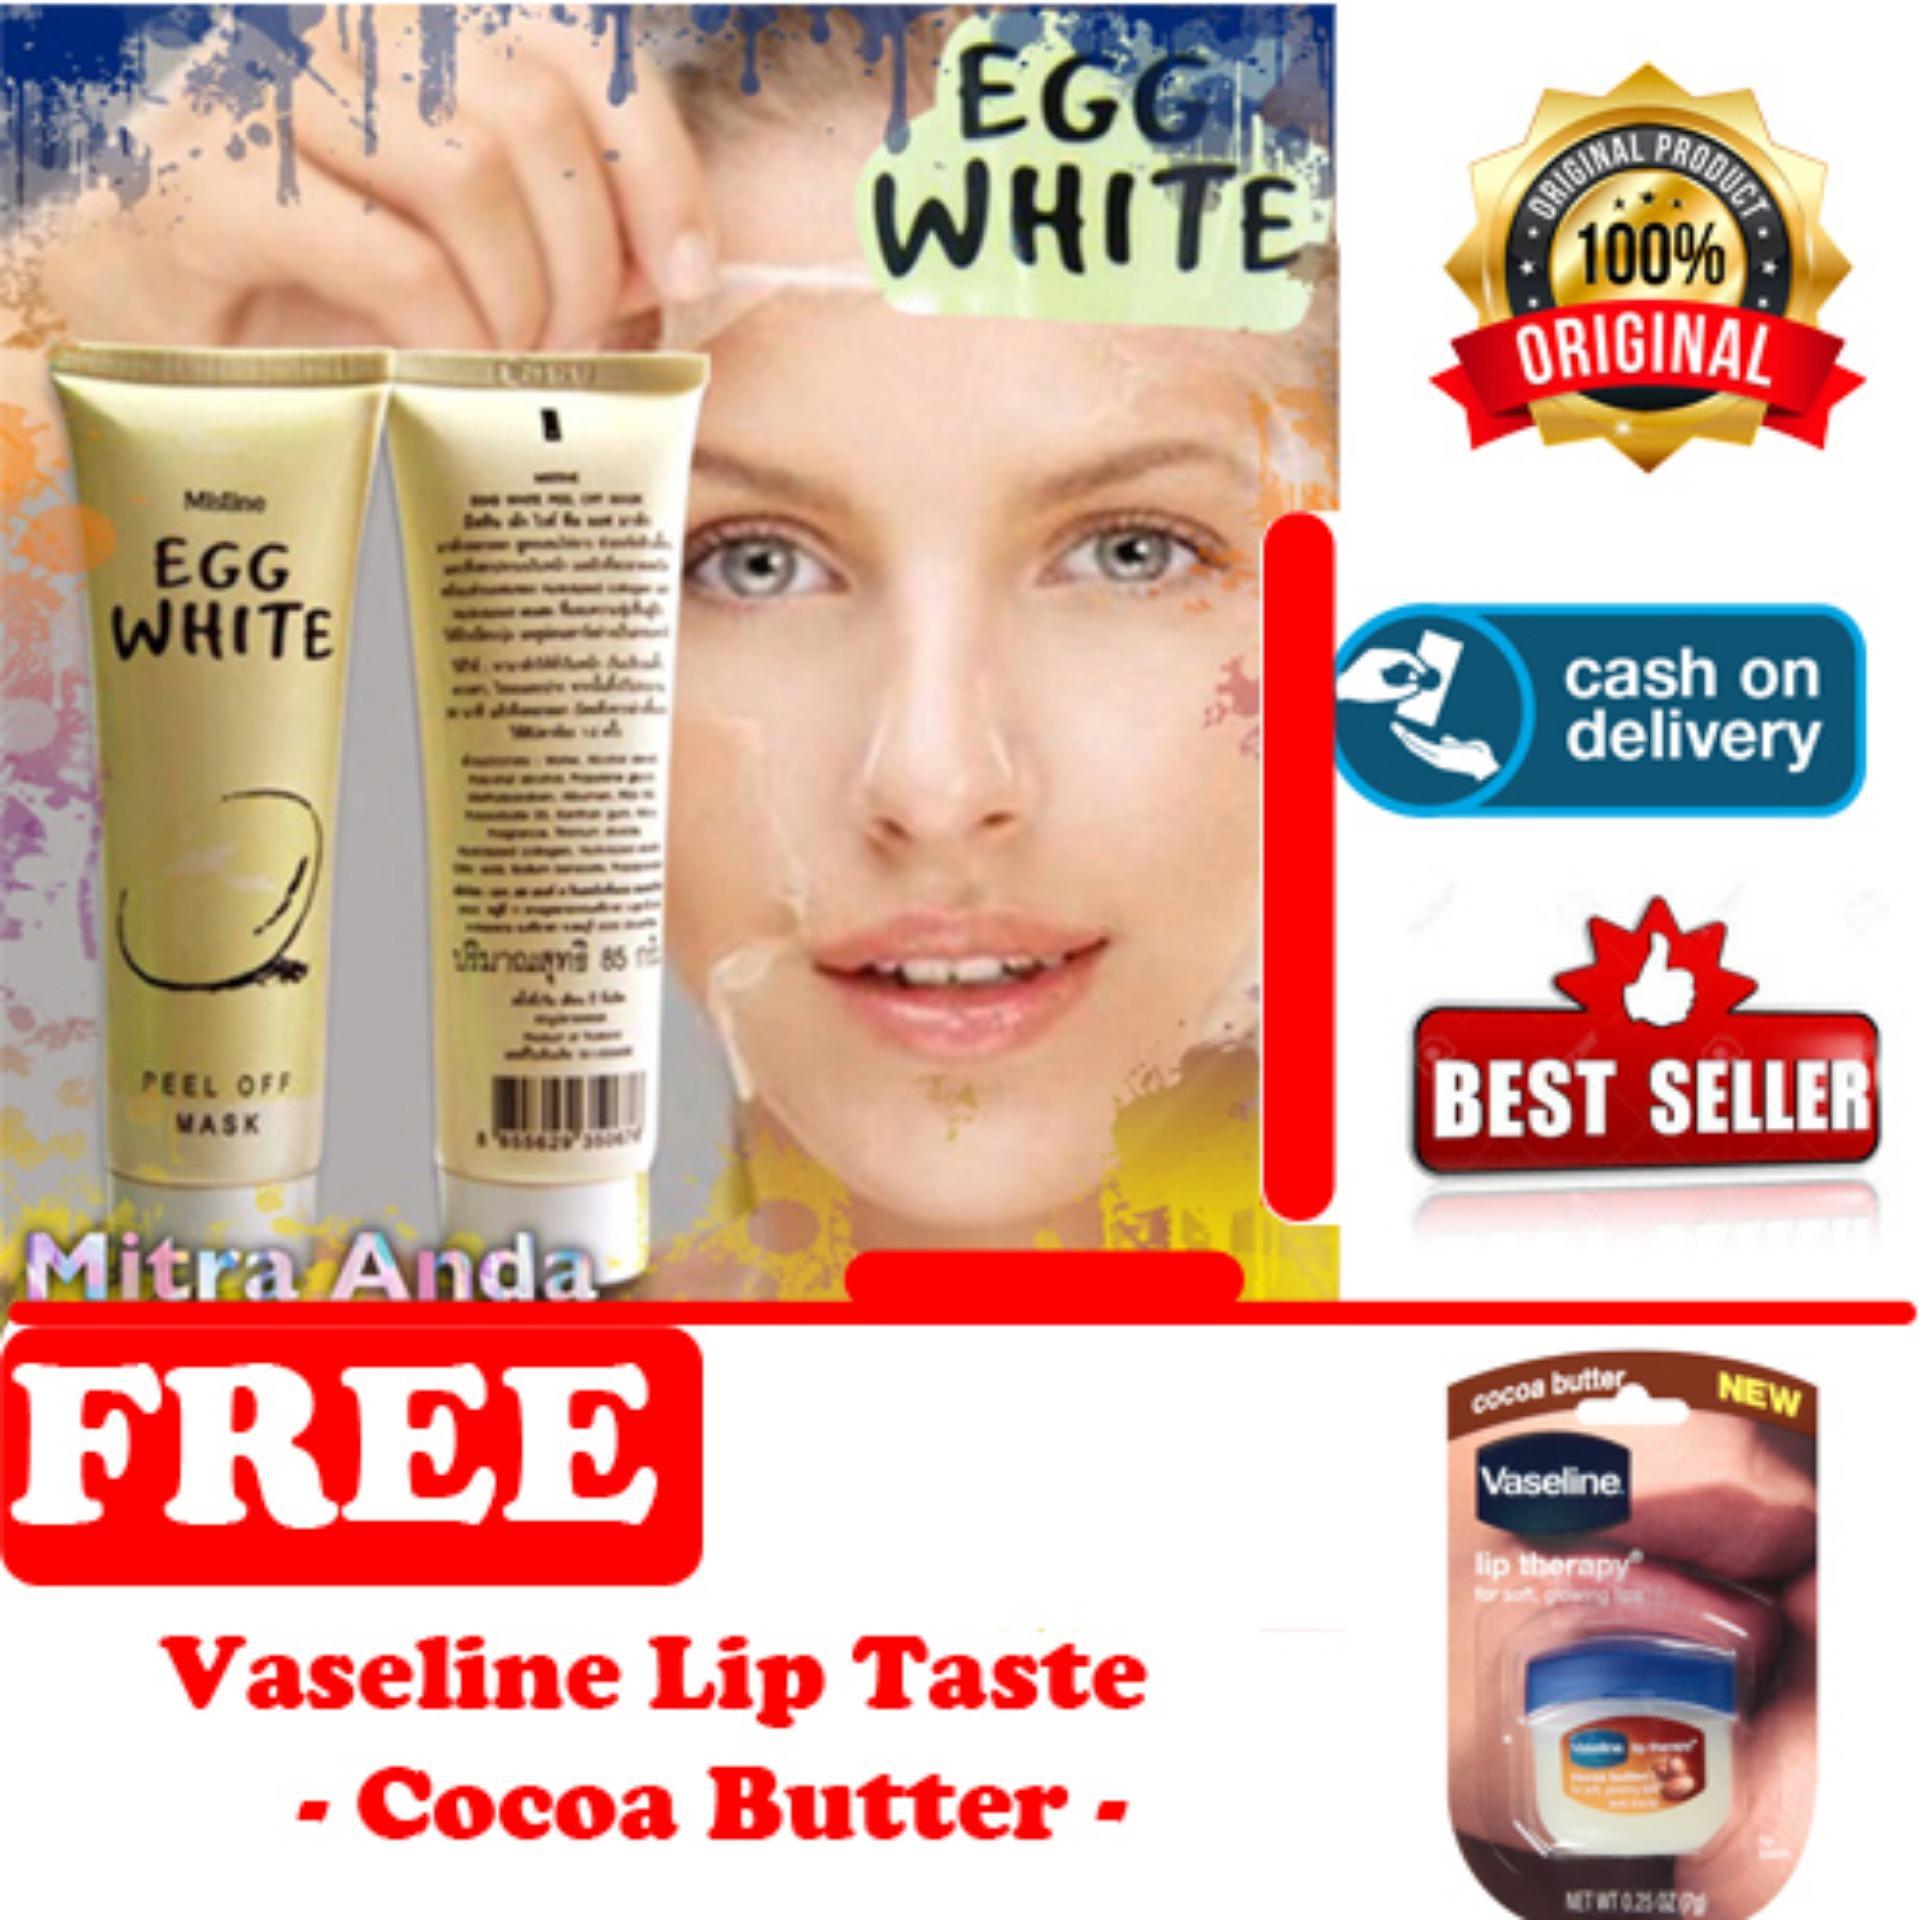 HOKI COD -  Mask Egg White Peel Off - Masker Putih Telur - 85 Gram - 1 Pcs + Gratis Vaseline Lip Therapy Cocoa Butter Therapy Premium - 7Gr